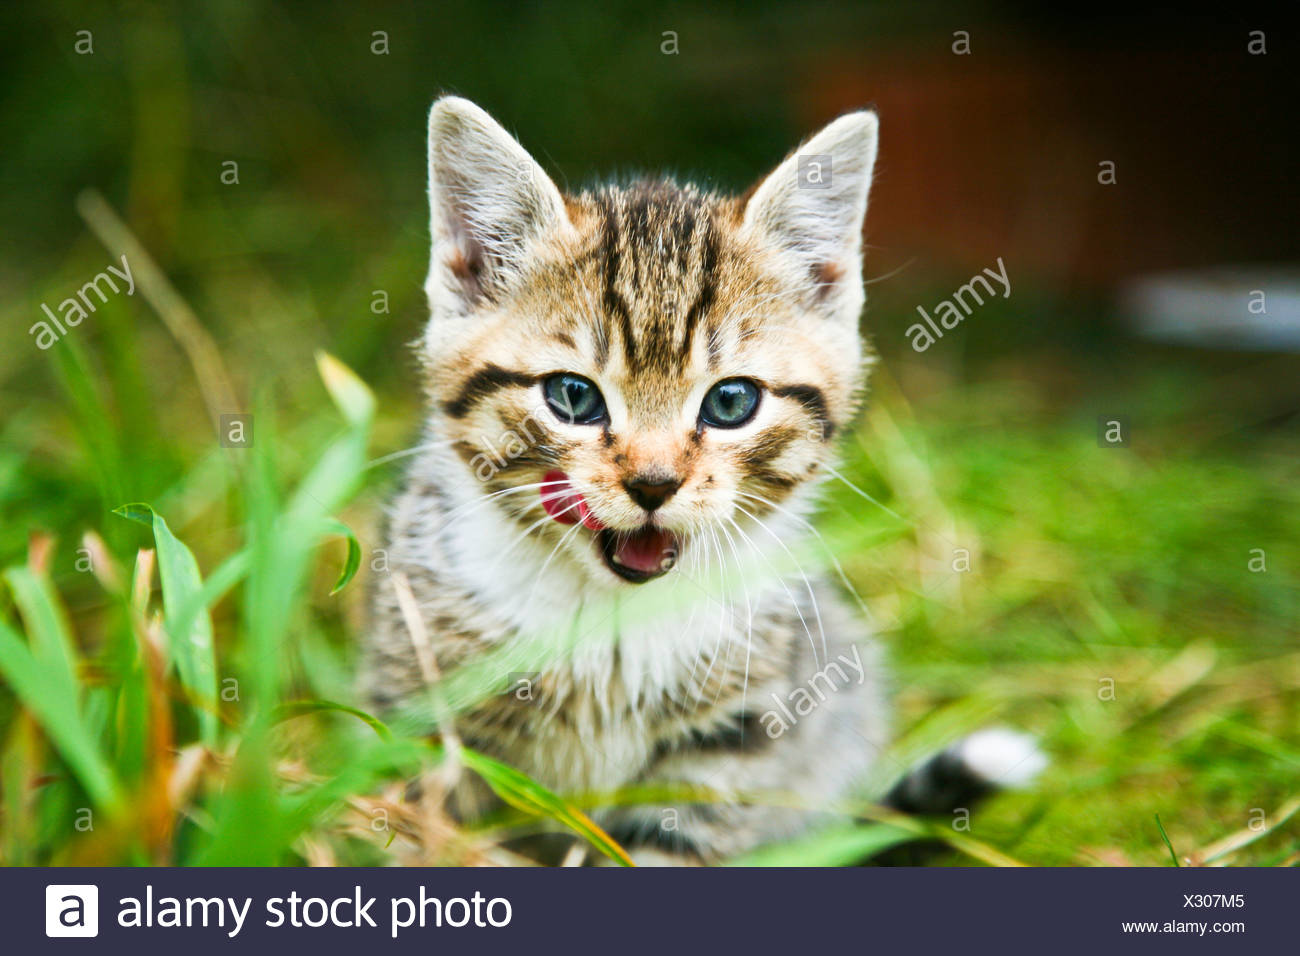 Domestic cat, kitten sitting in the grass Stock Photo